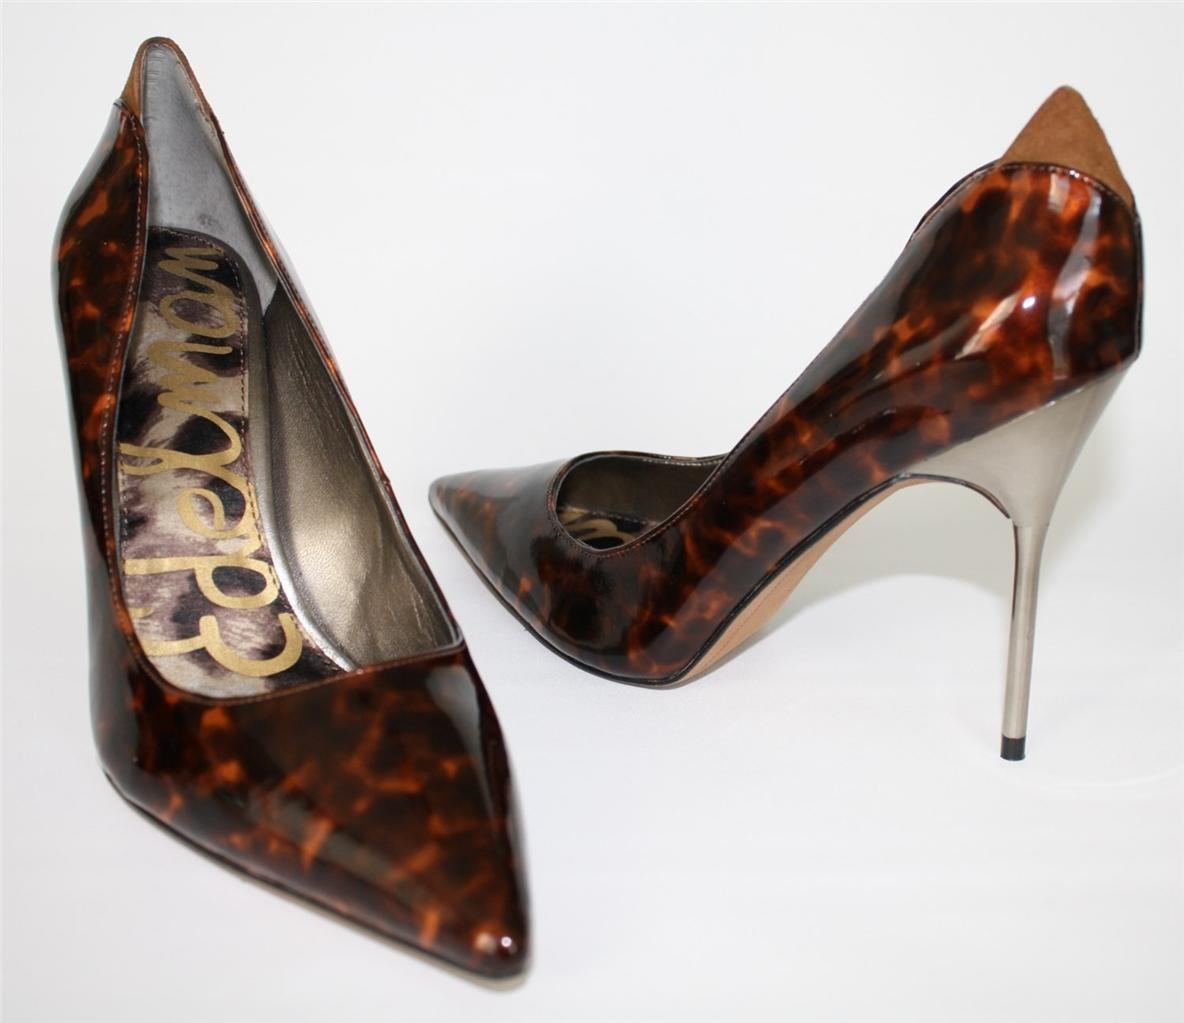 b130c787cc9c Image is loading Womens-Shoes-Sam-Edelman-DANIELLE-Stiletto-Pumps-Heels-